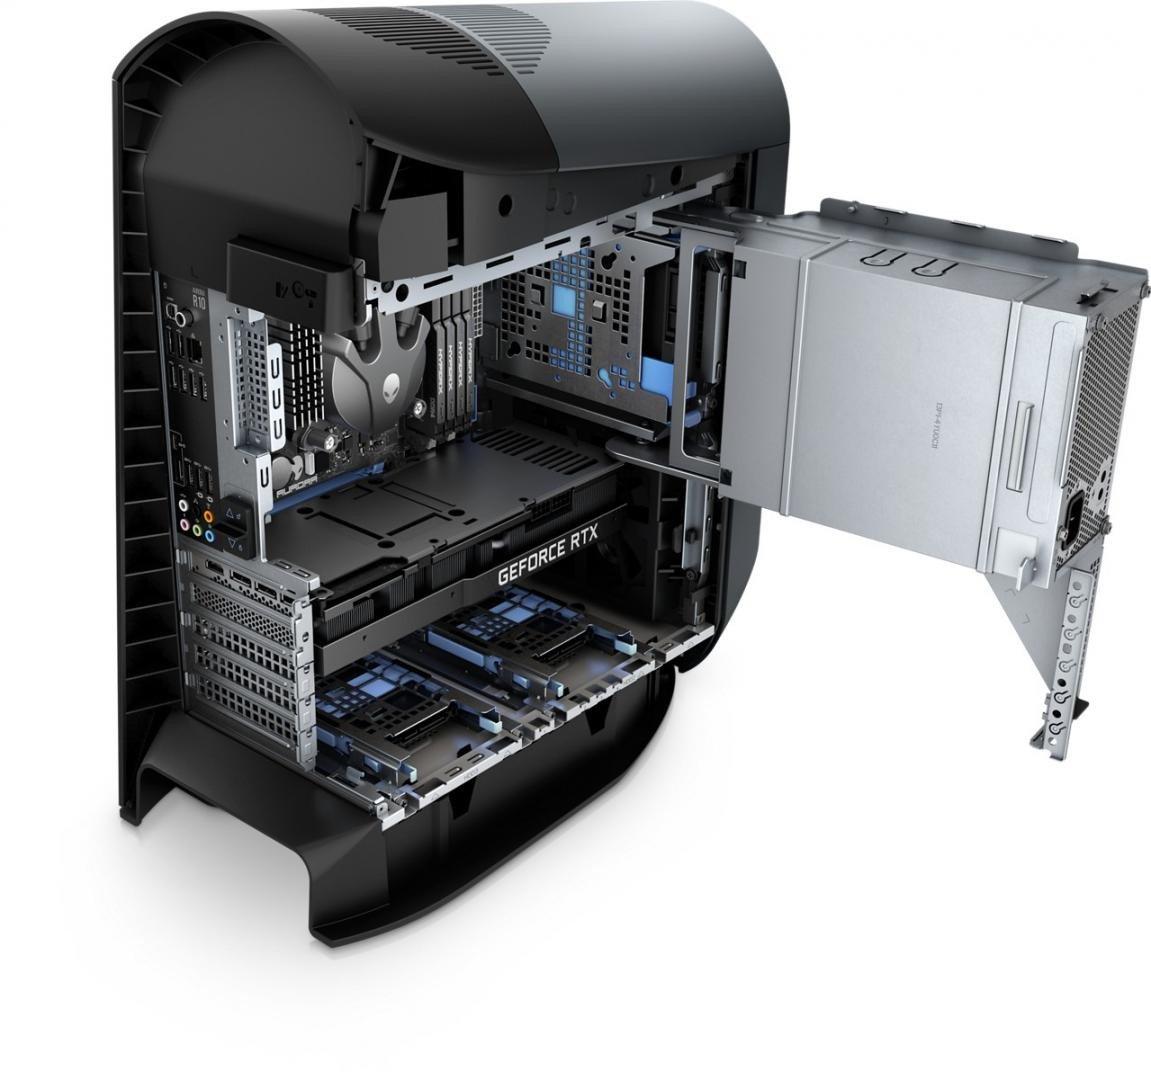 Dell Gaming Desktop Alienware Aurora R10, AMD Ryzen 9 5900X, 16GB, 256GB SSD, 1TB HDD, GeForce RTX 3080, W10 Pro - imaginea 8